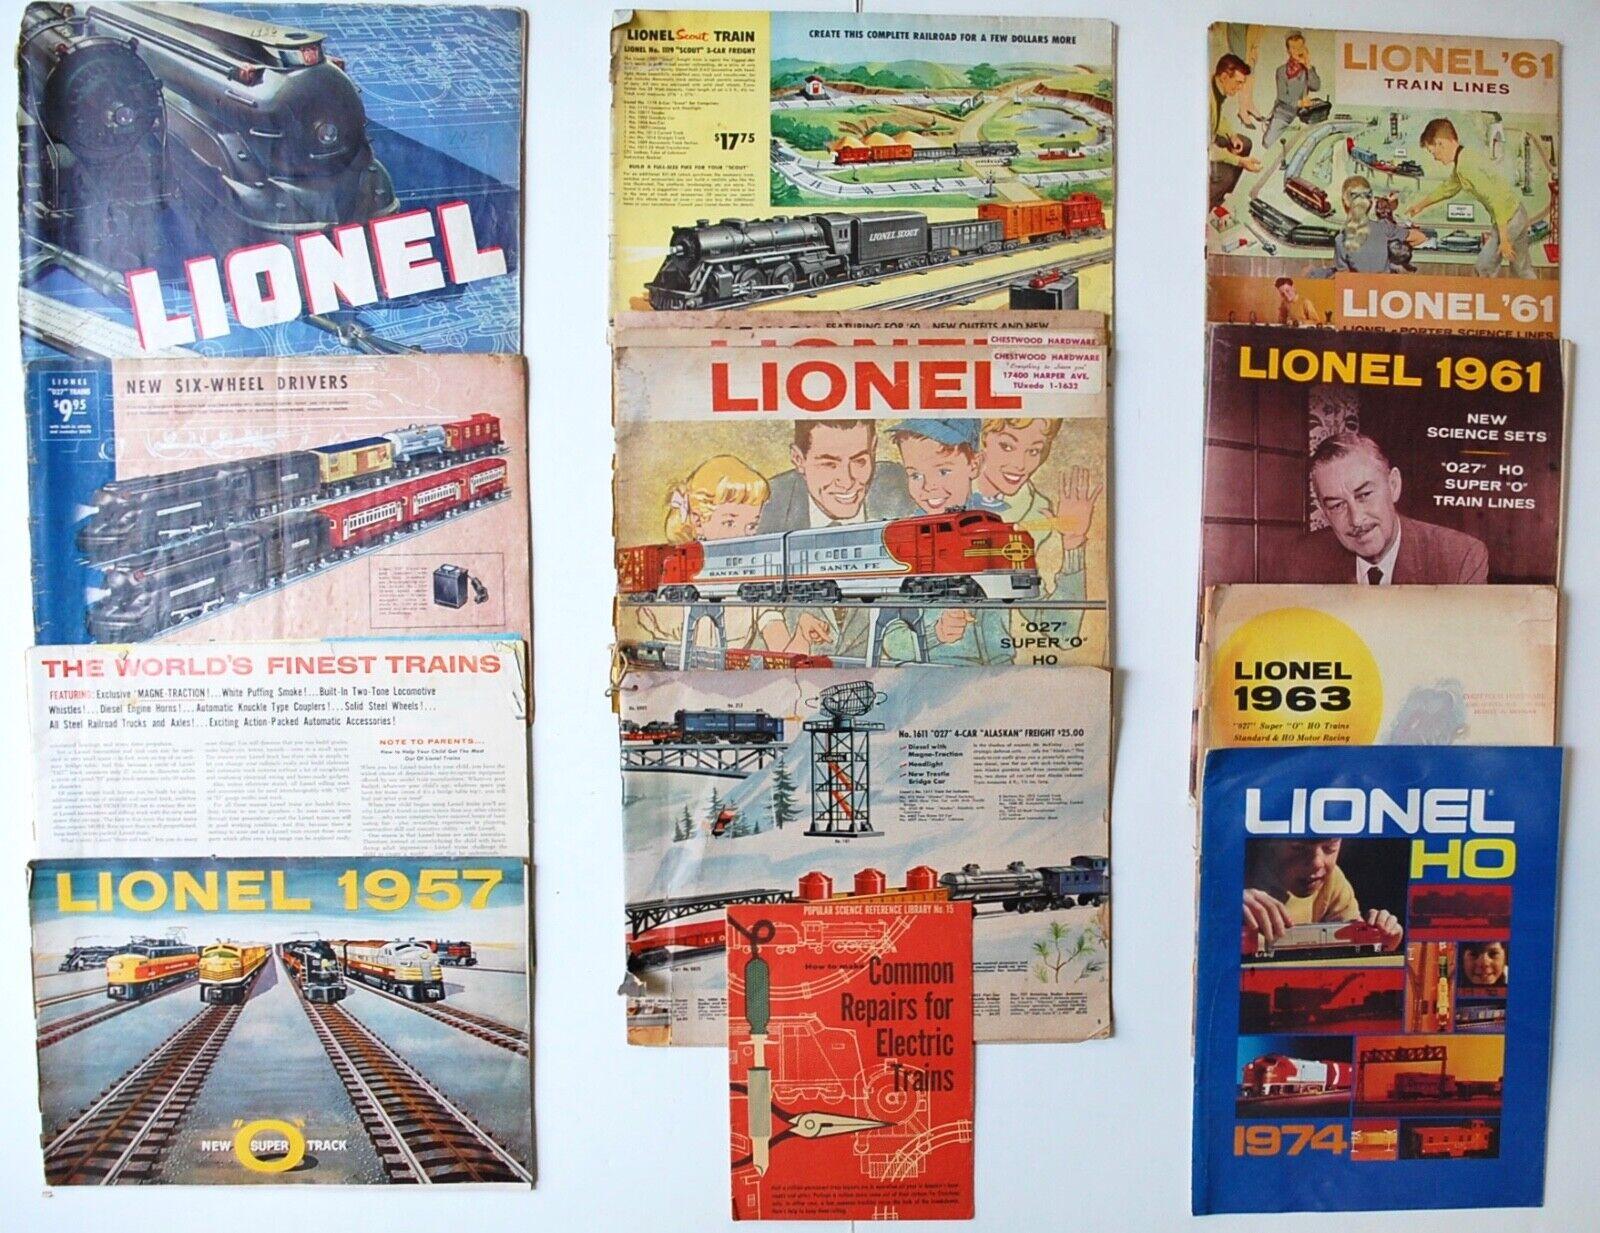 Vintage Lionel Model Train Catalogs 1936 1937 1950s 1960s Common Repairs Book